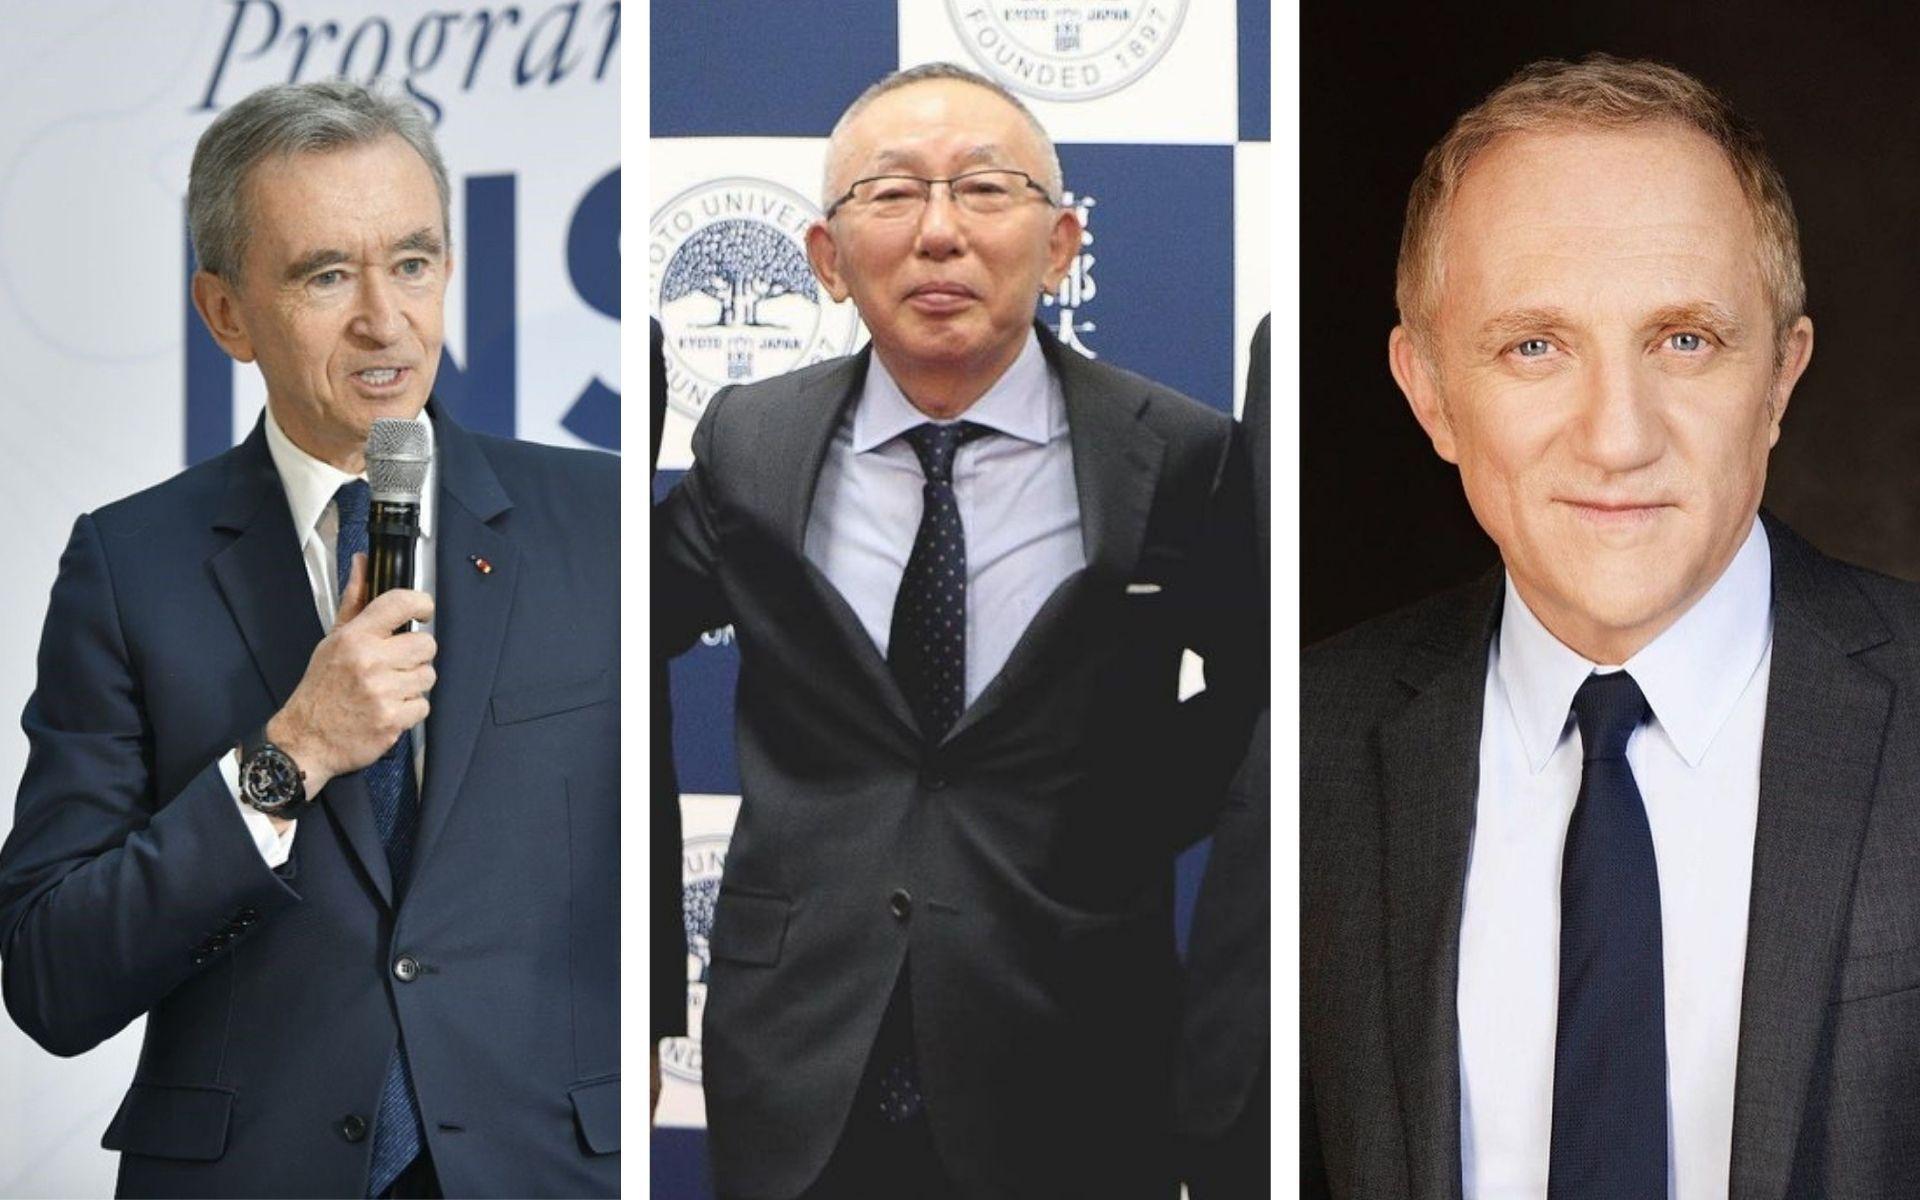 Bernard Arnault, Tadashi Yanai and François Pinault